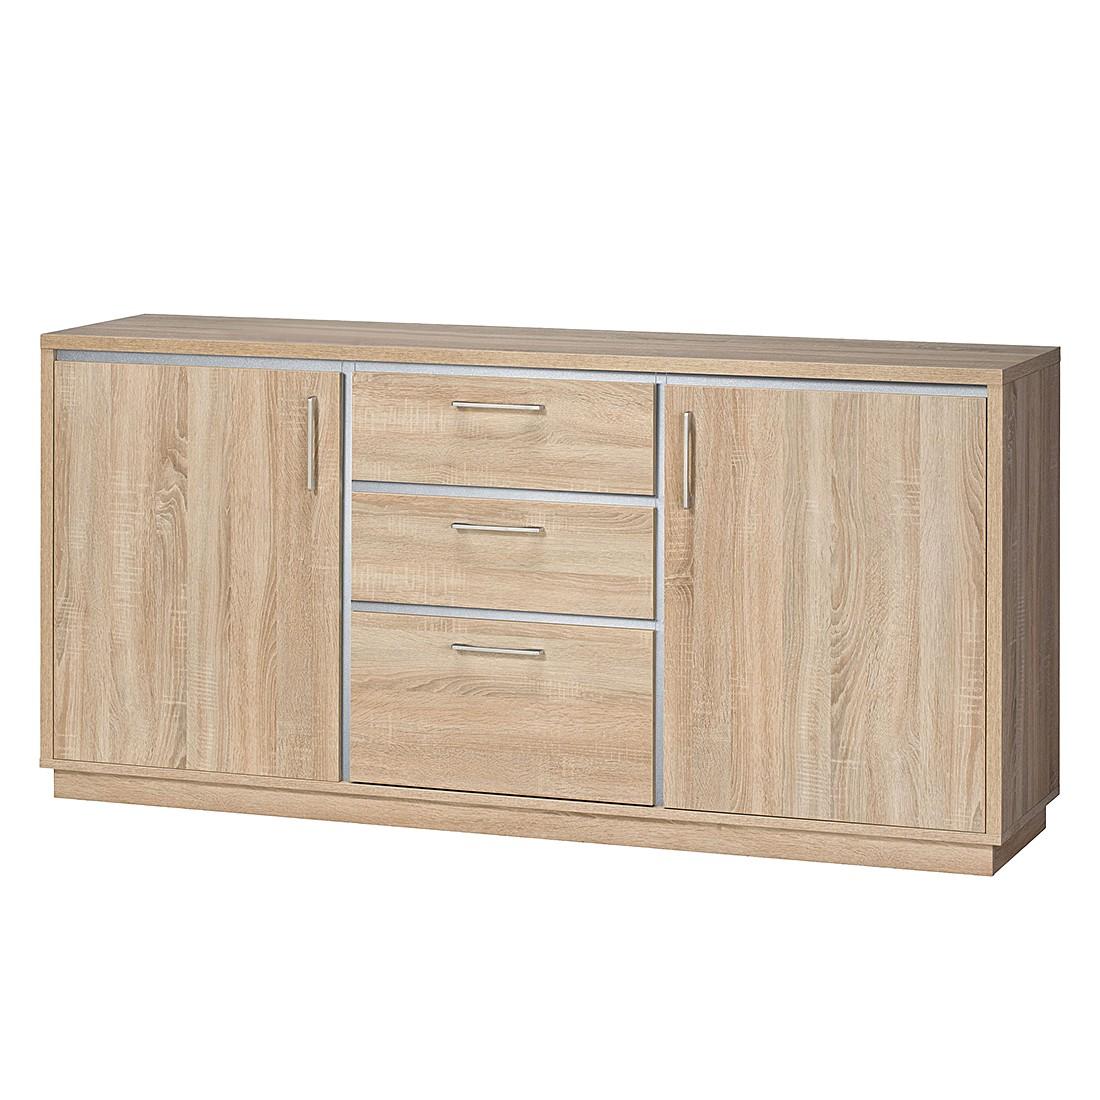 sideboard eiche sonoma dekor g nstig kaufen. Black Bedroom Furniture Sets. Home Design Ideas